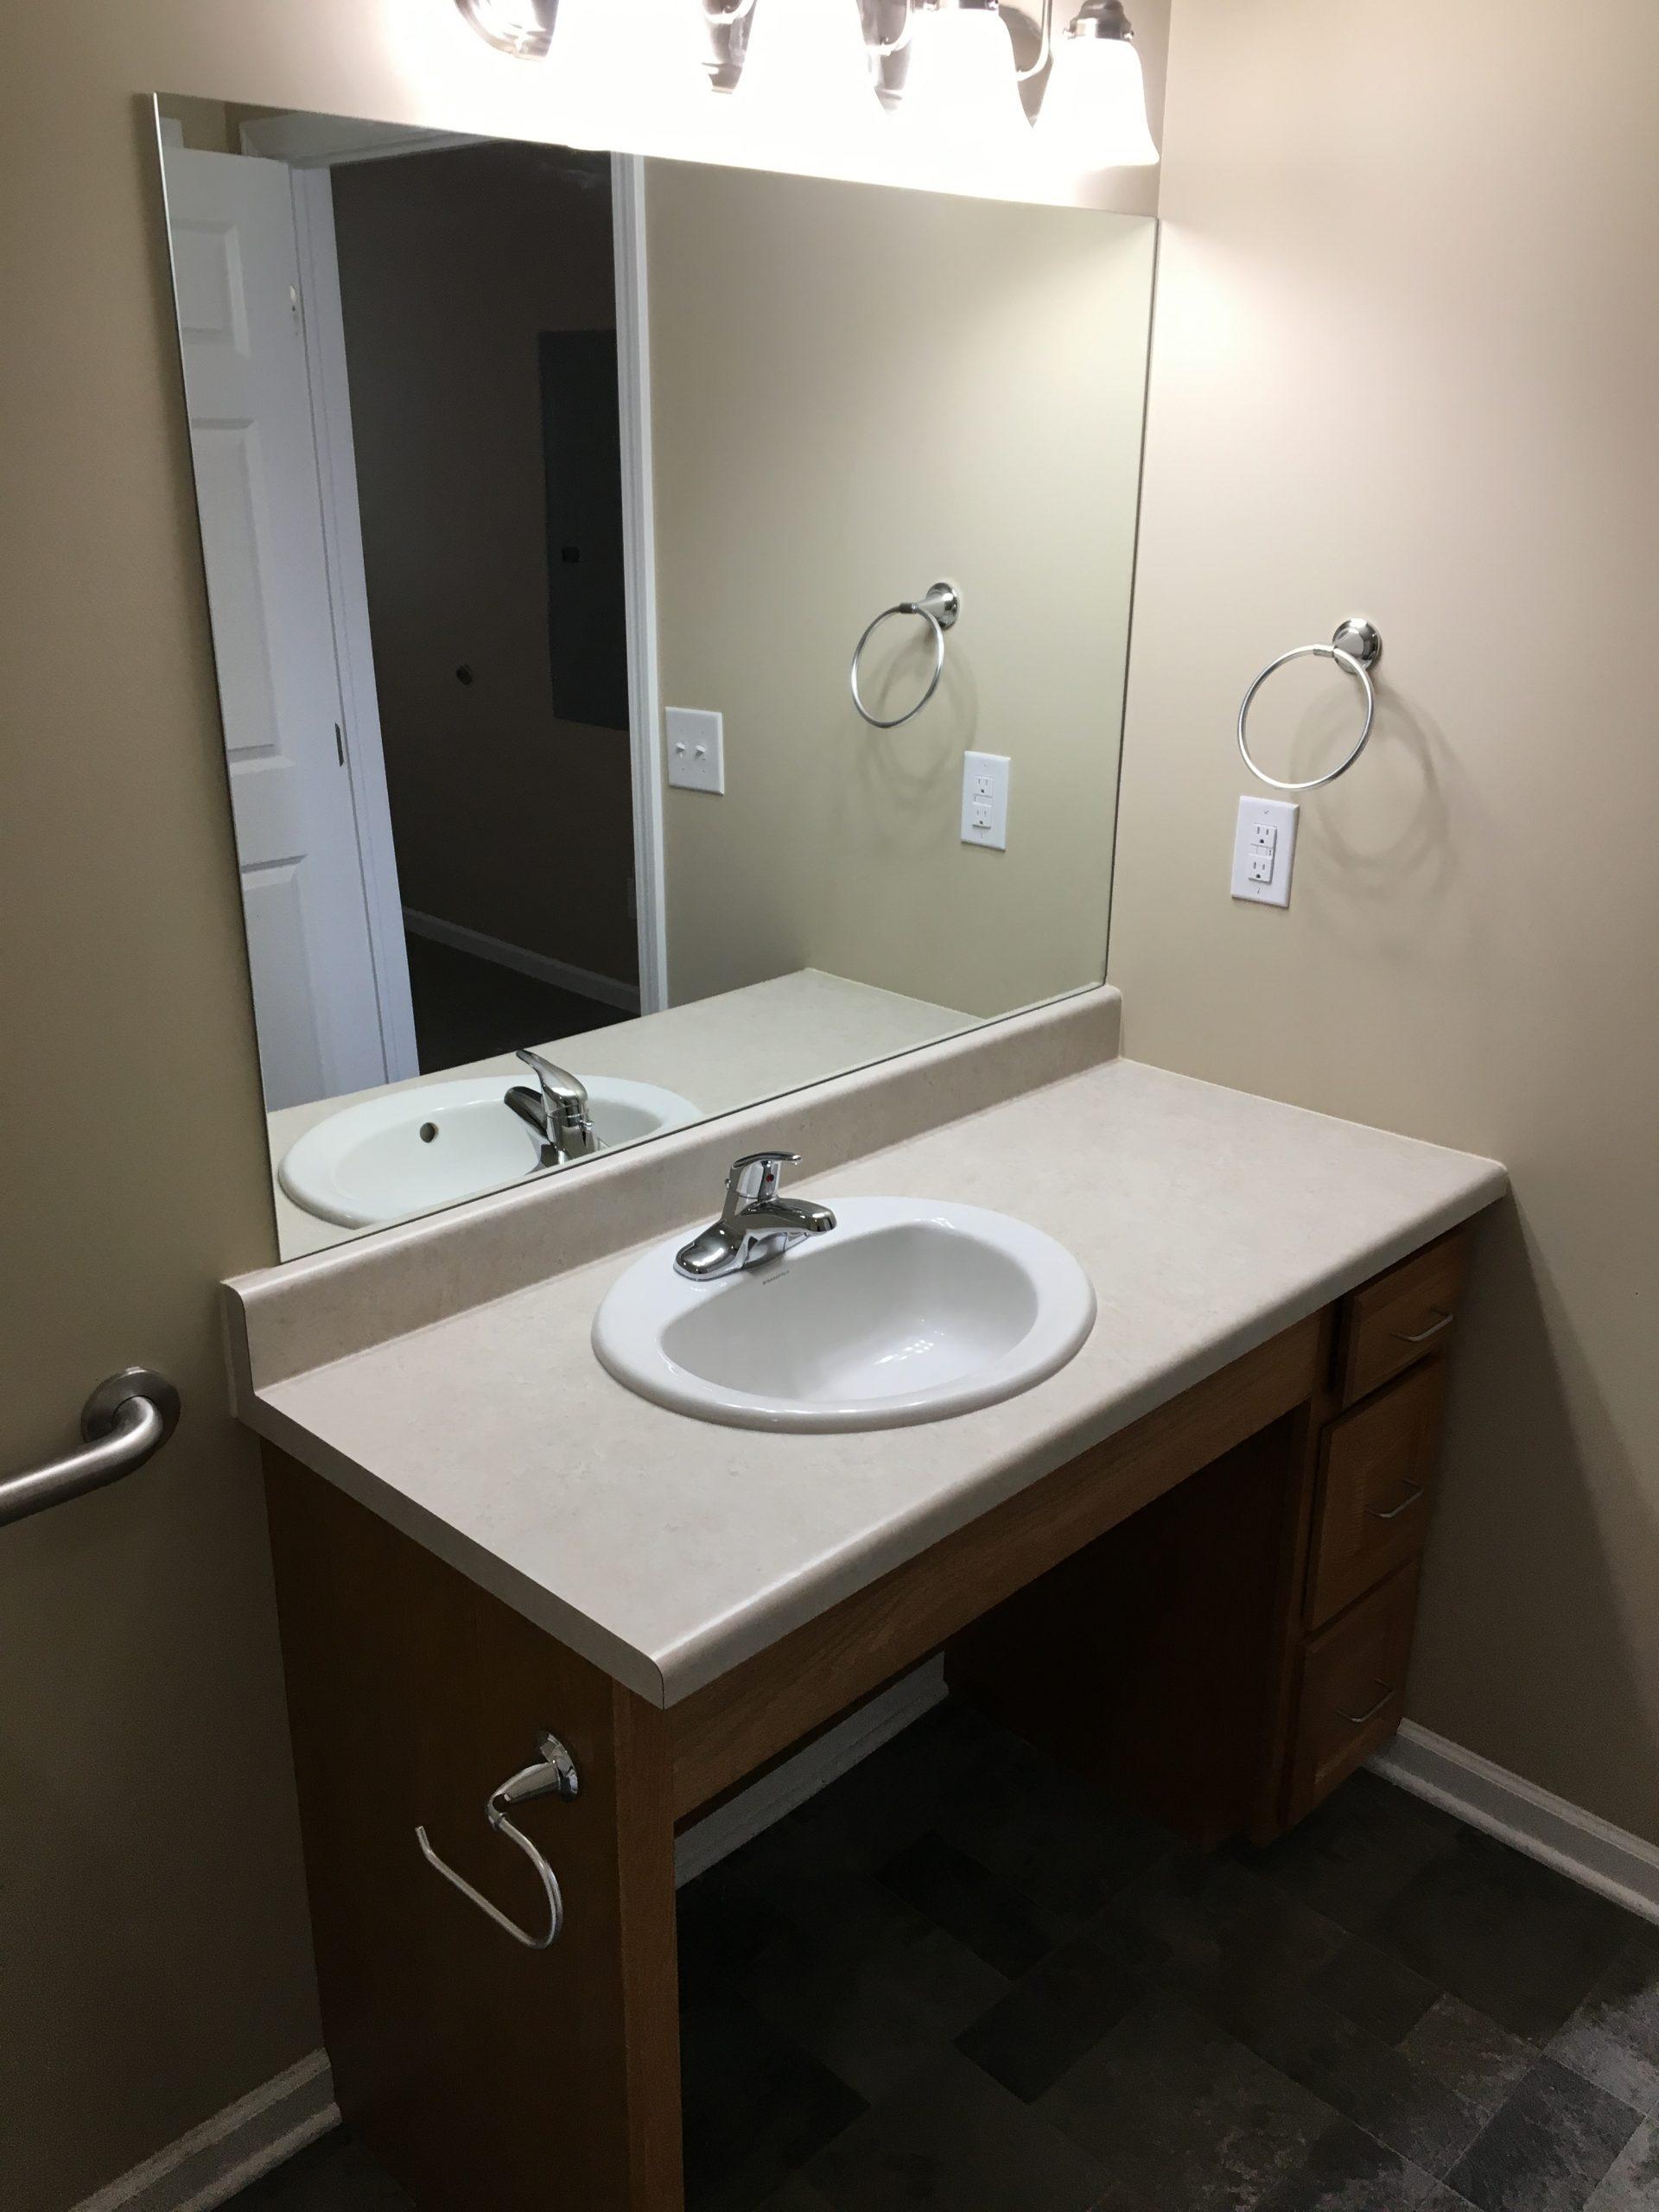 jefferson-estates-handicap-bathroom-2